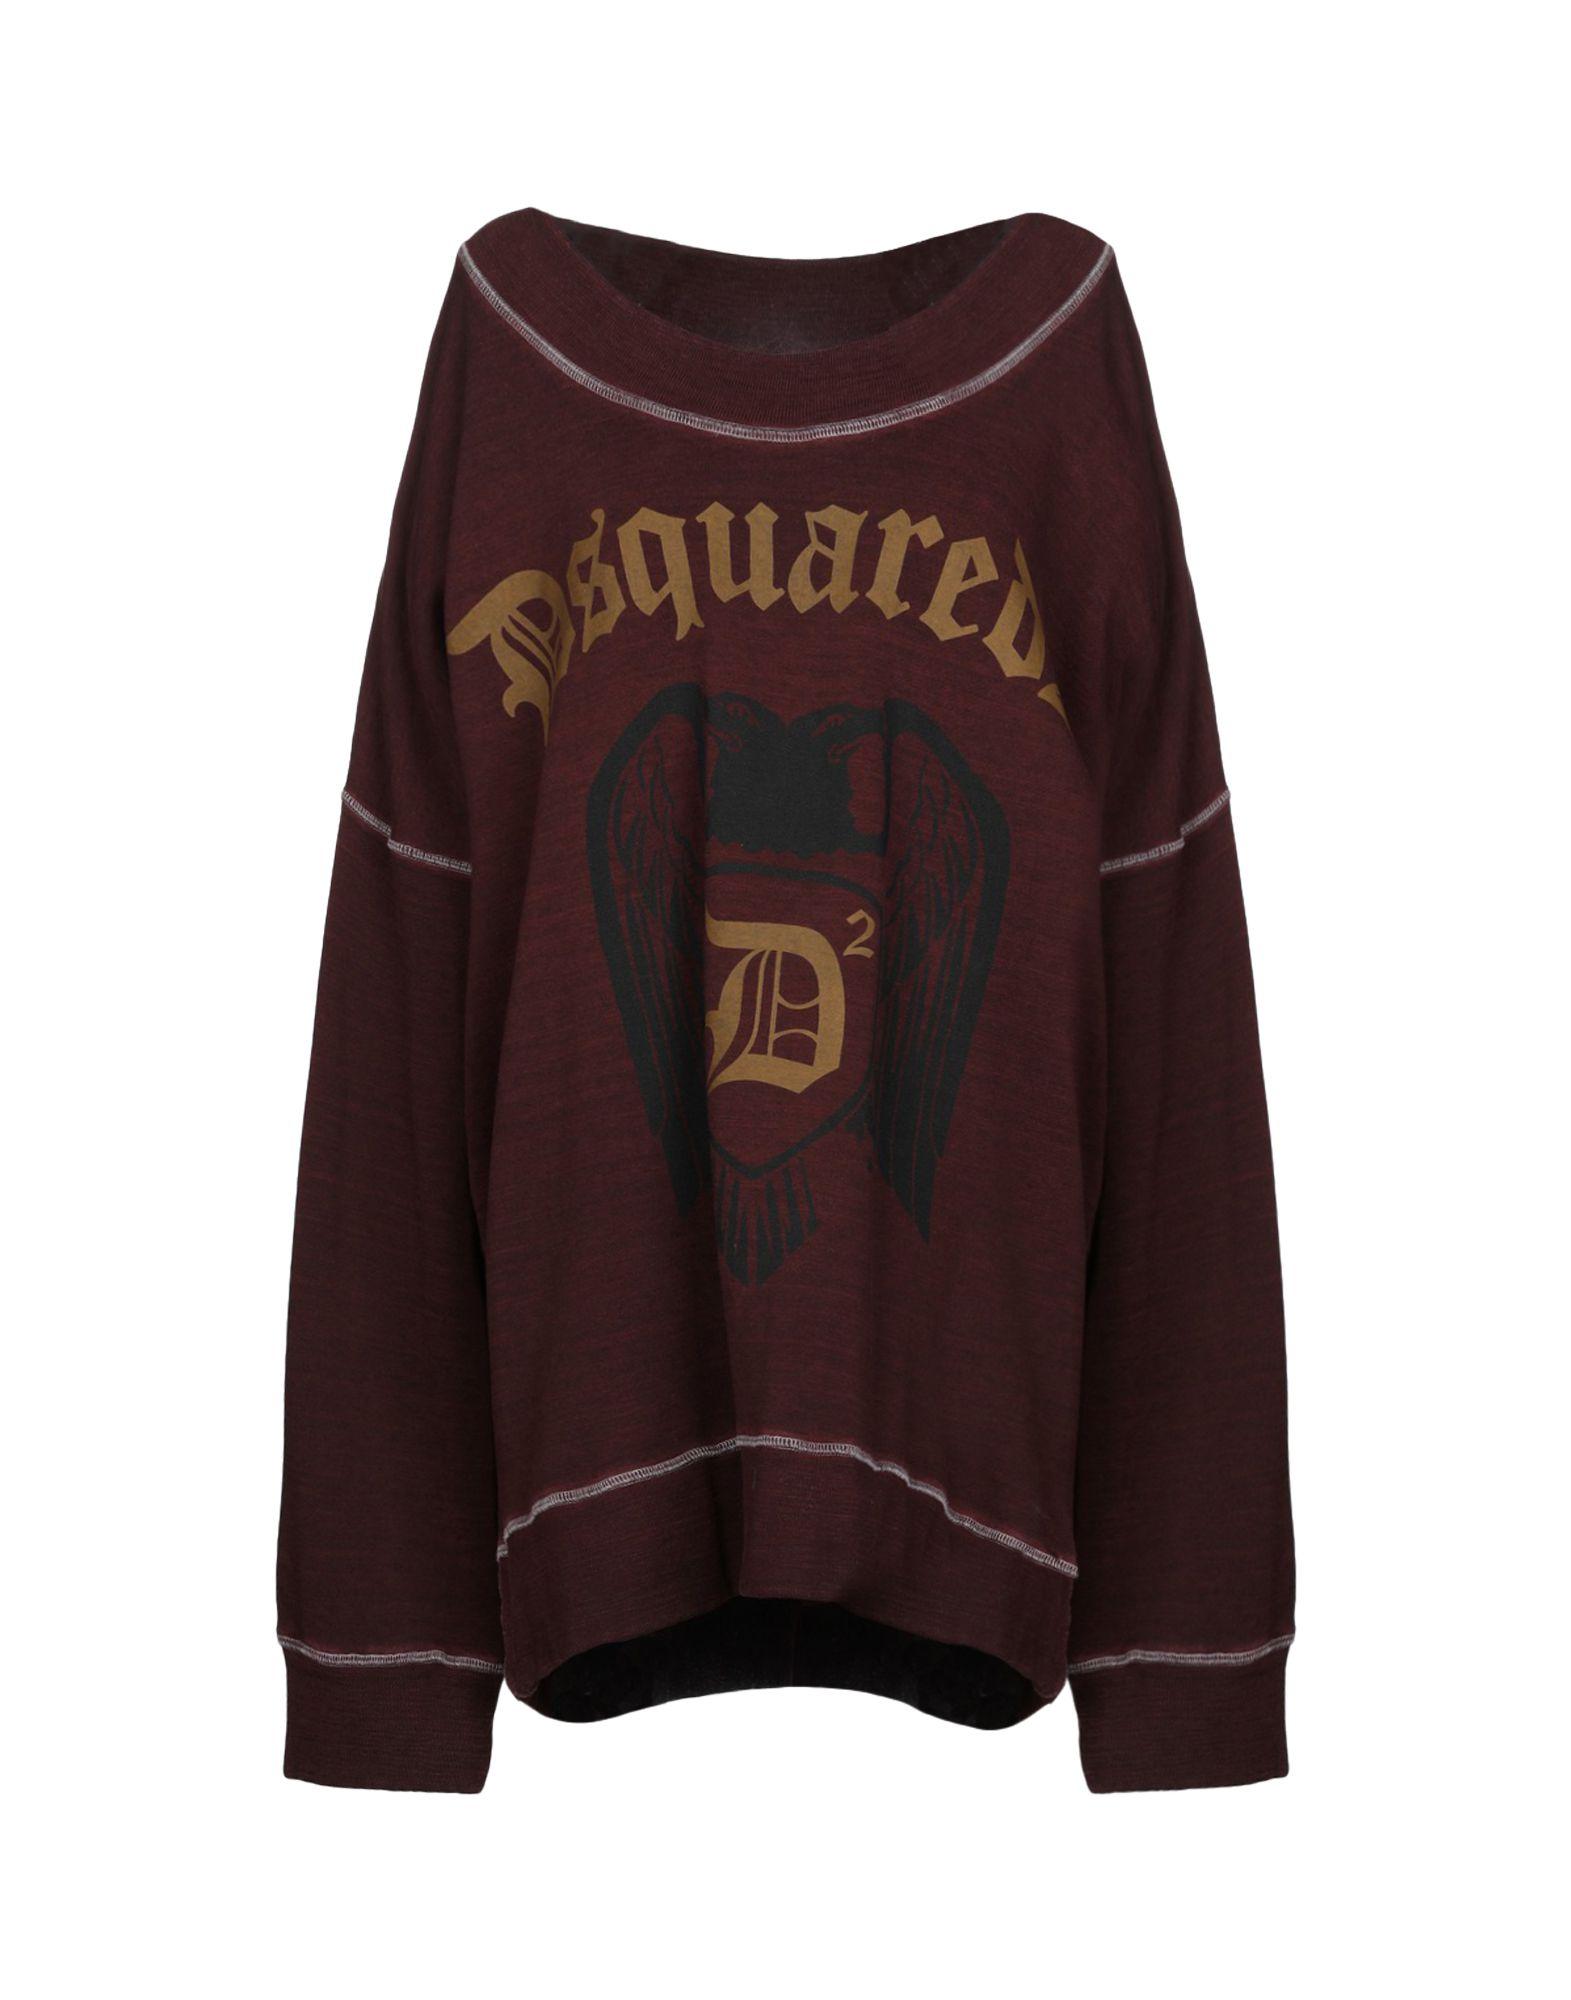 DSQUARED2 Damen Sweatshirt3 bordeaux,rot